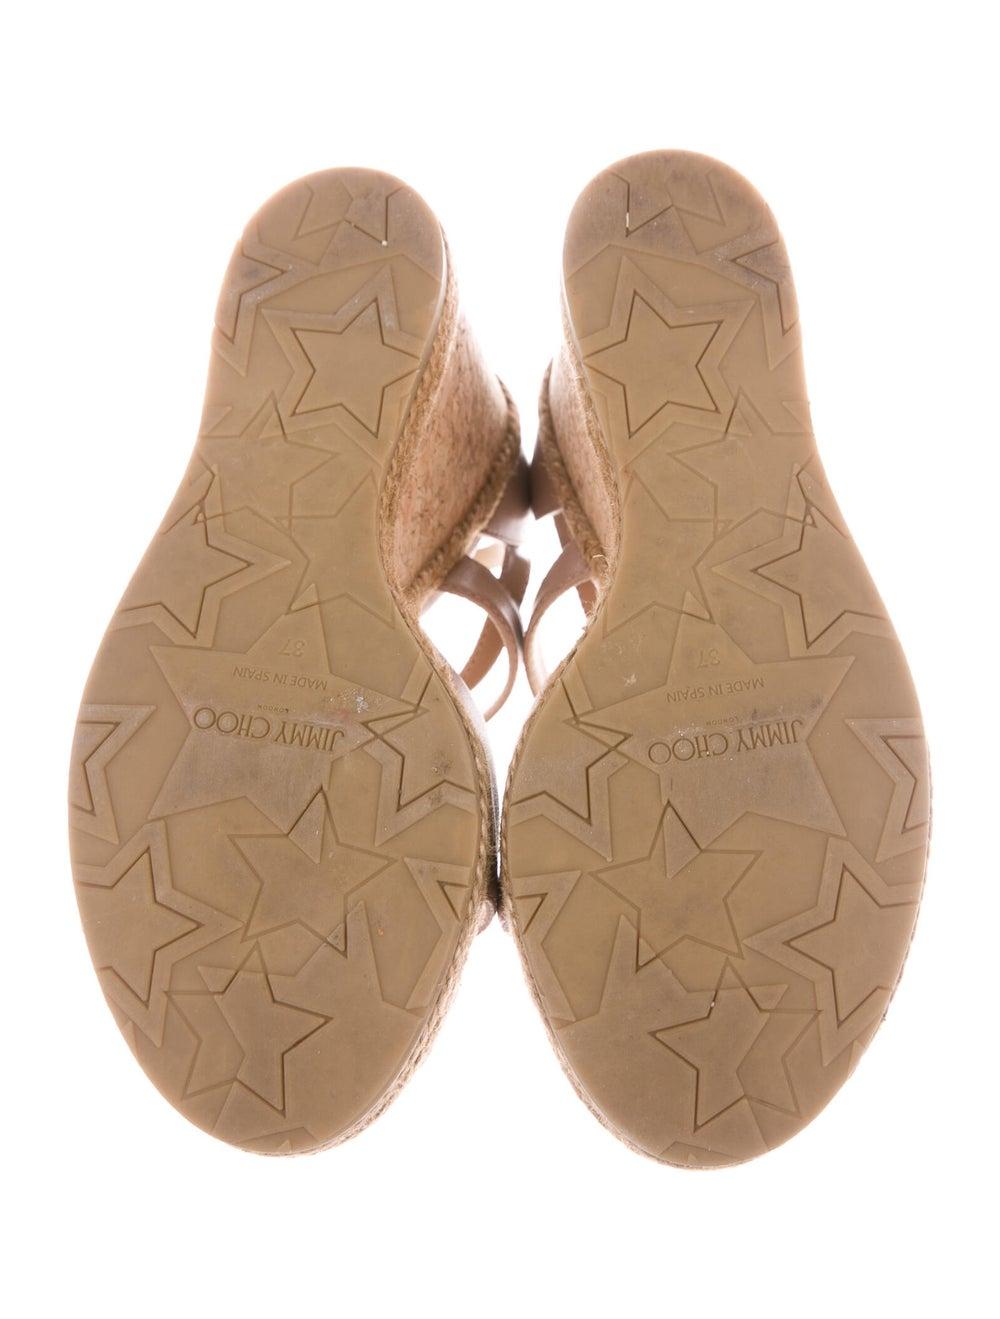 Jimmy Choo Leather Espadrilles Pink - image 5